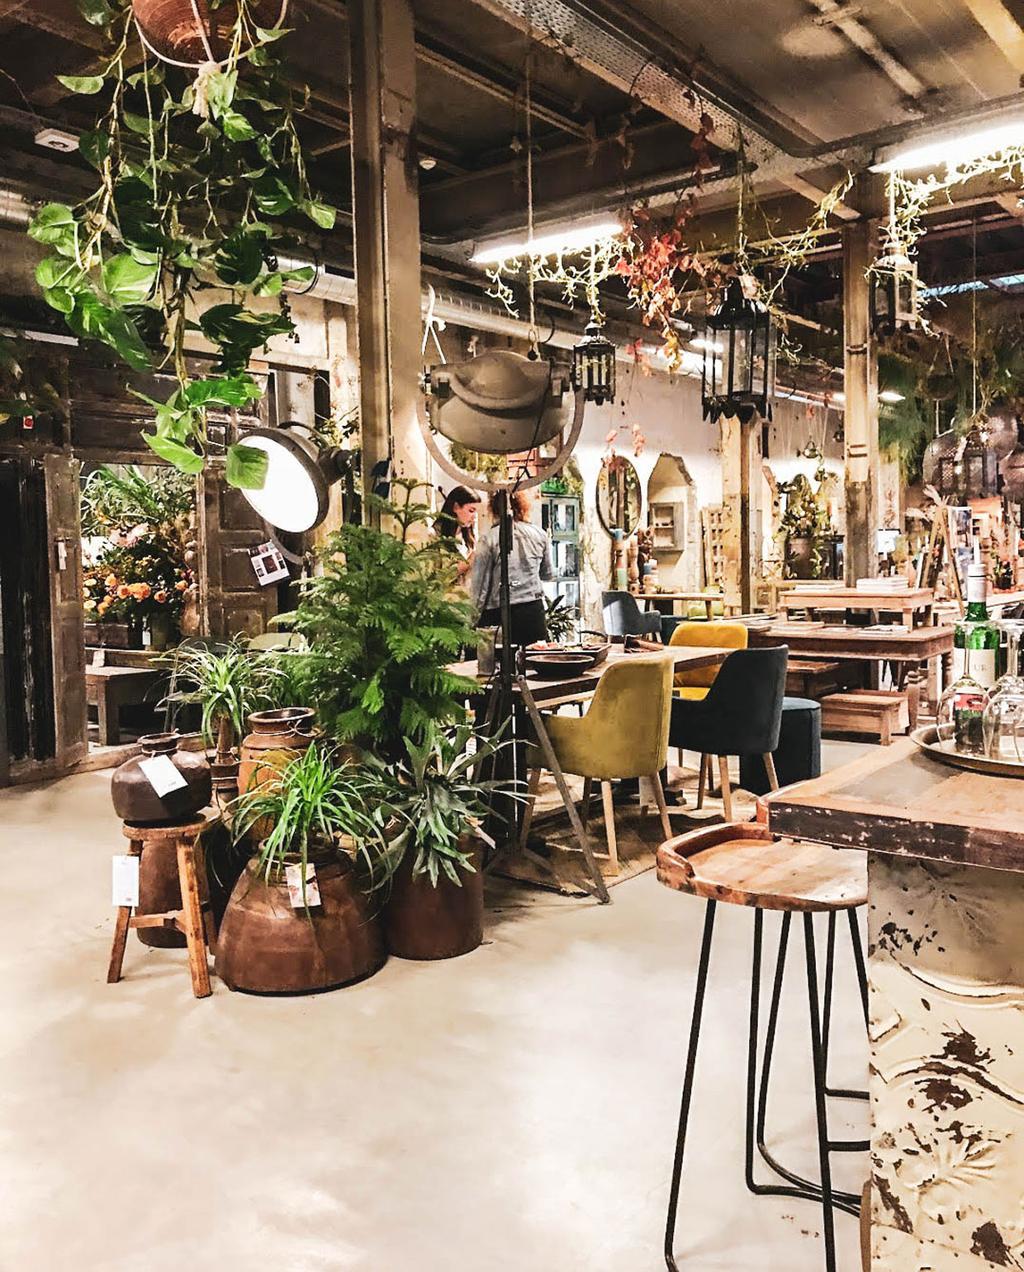 vtwonen 10-2019 | Citytrip Eindhoven Room 108 & Gusj Market